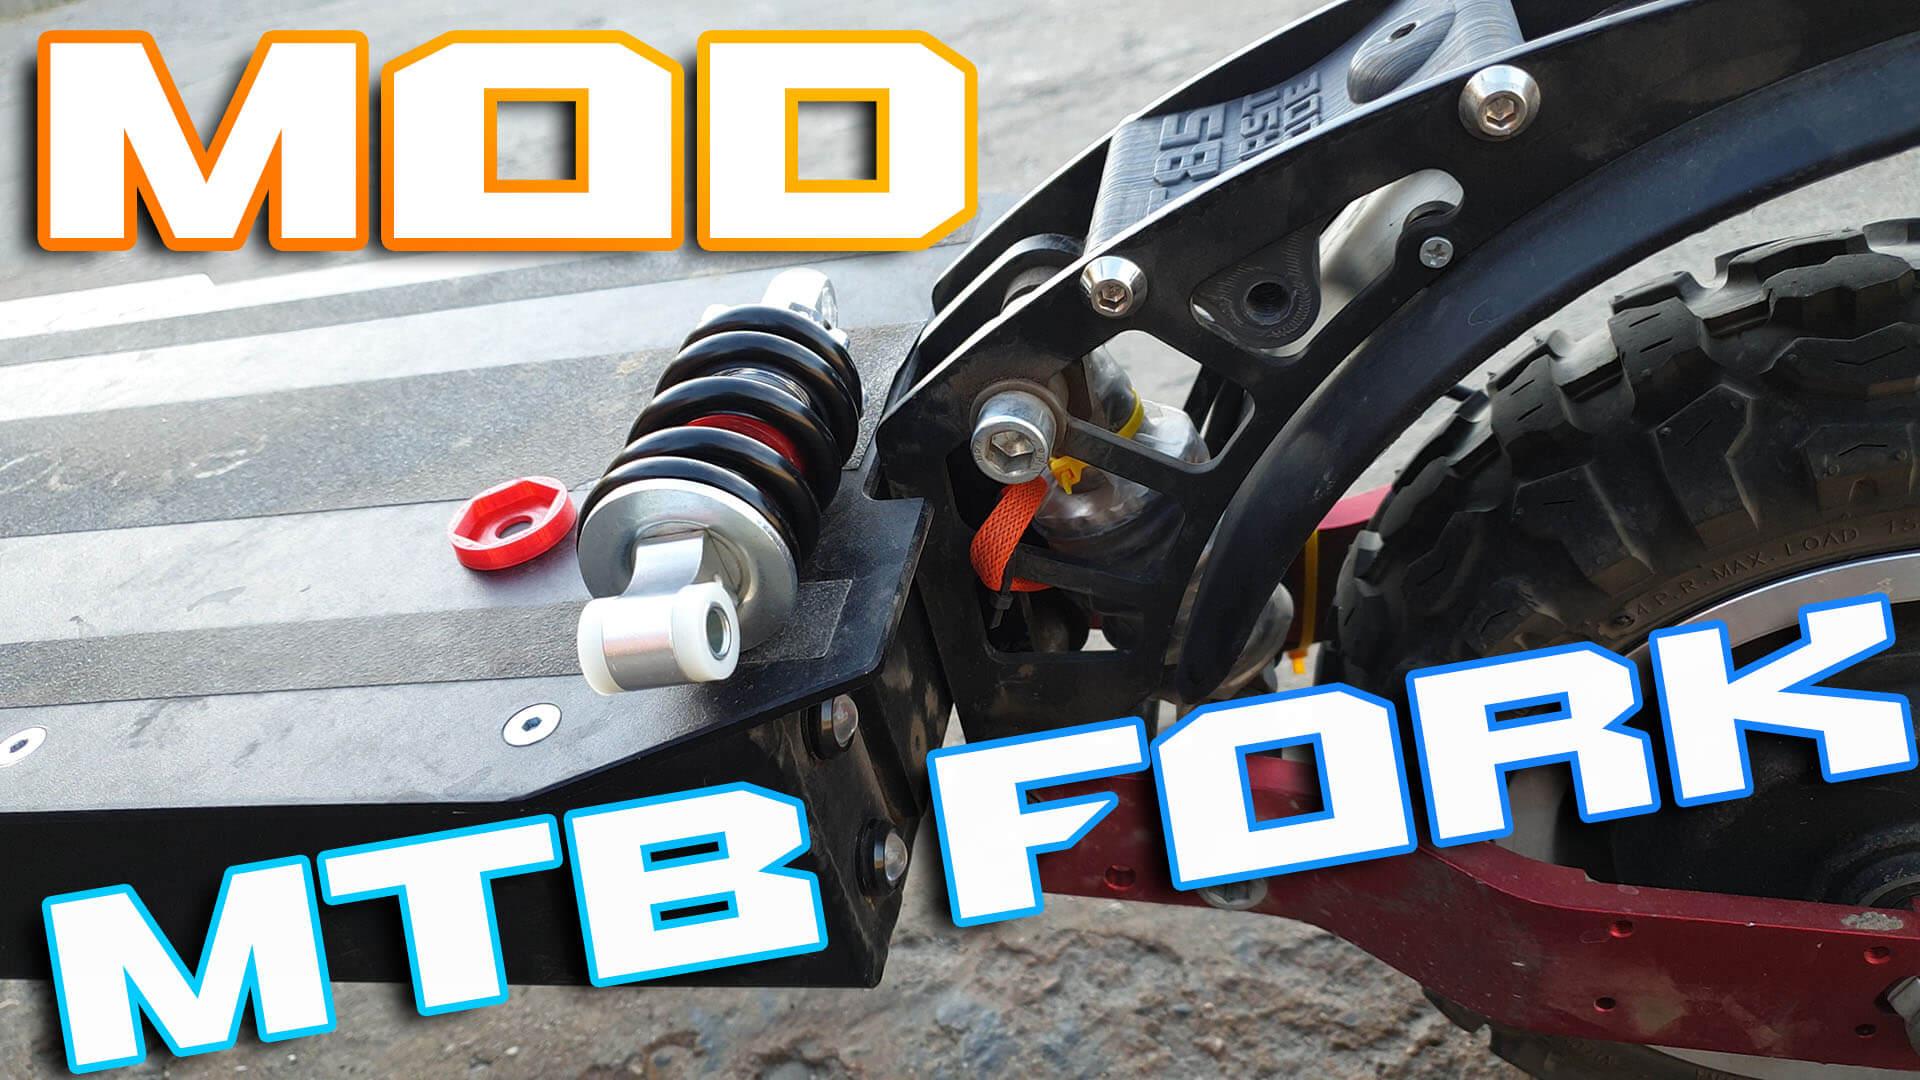 MTB Shock MOD for Janobike T85, Boyueda …